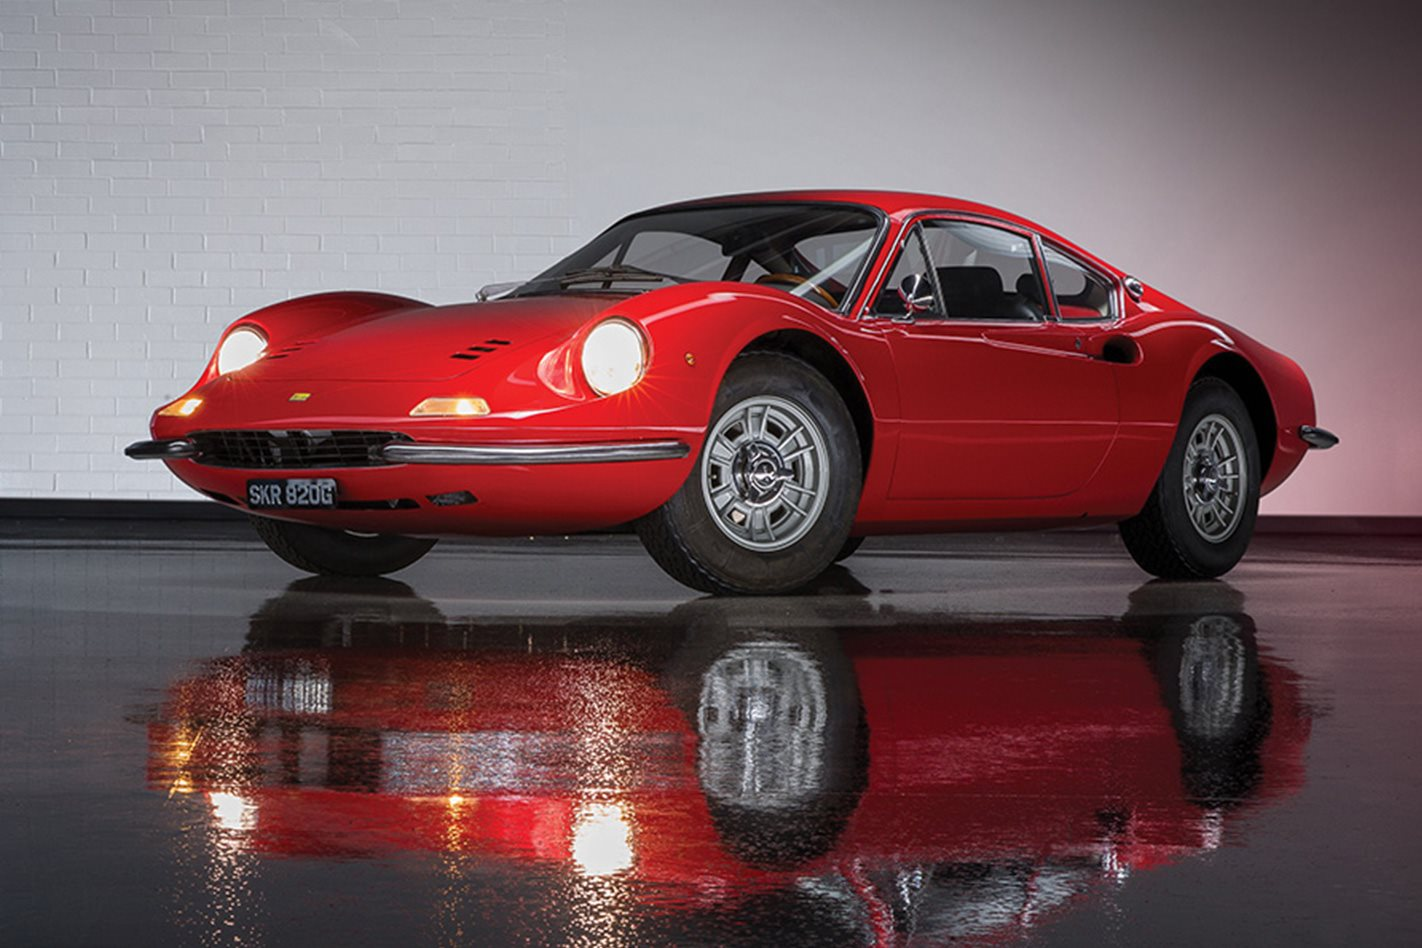 1969-Ferrari-Dino-206-GT-headlights.jpg